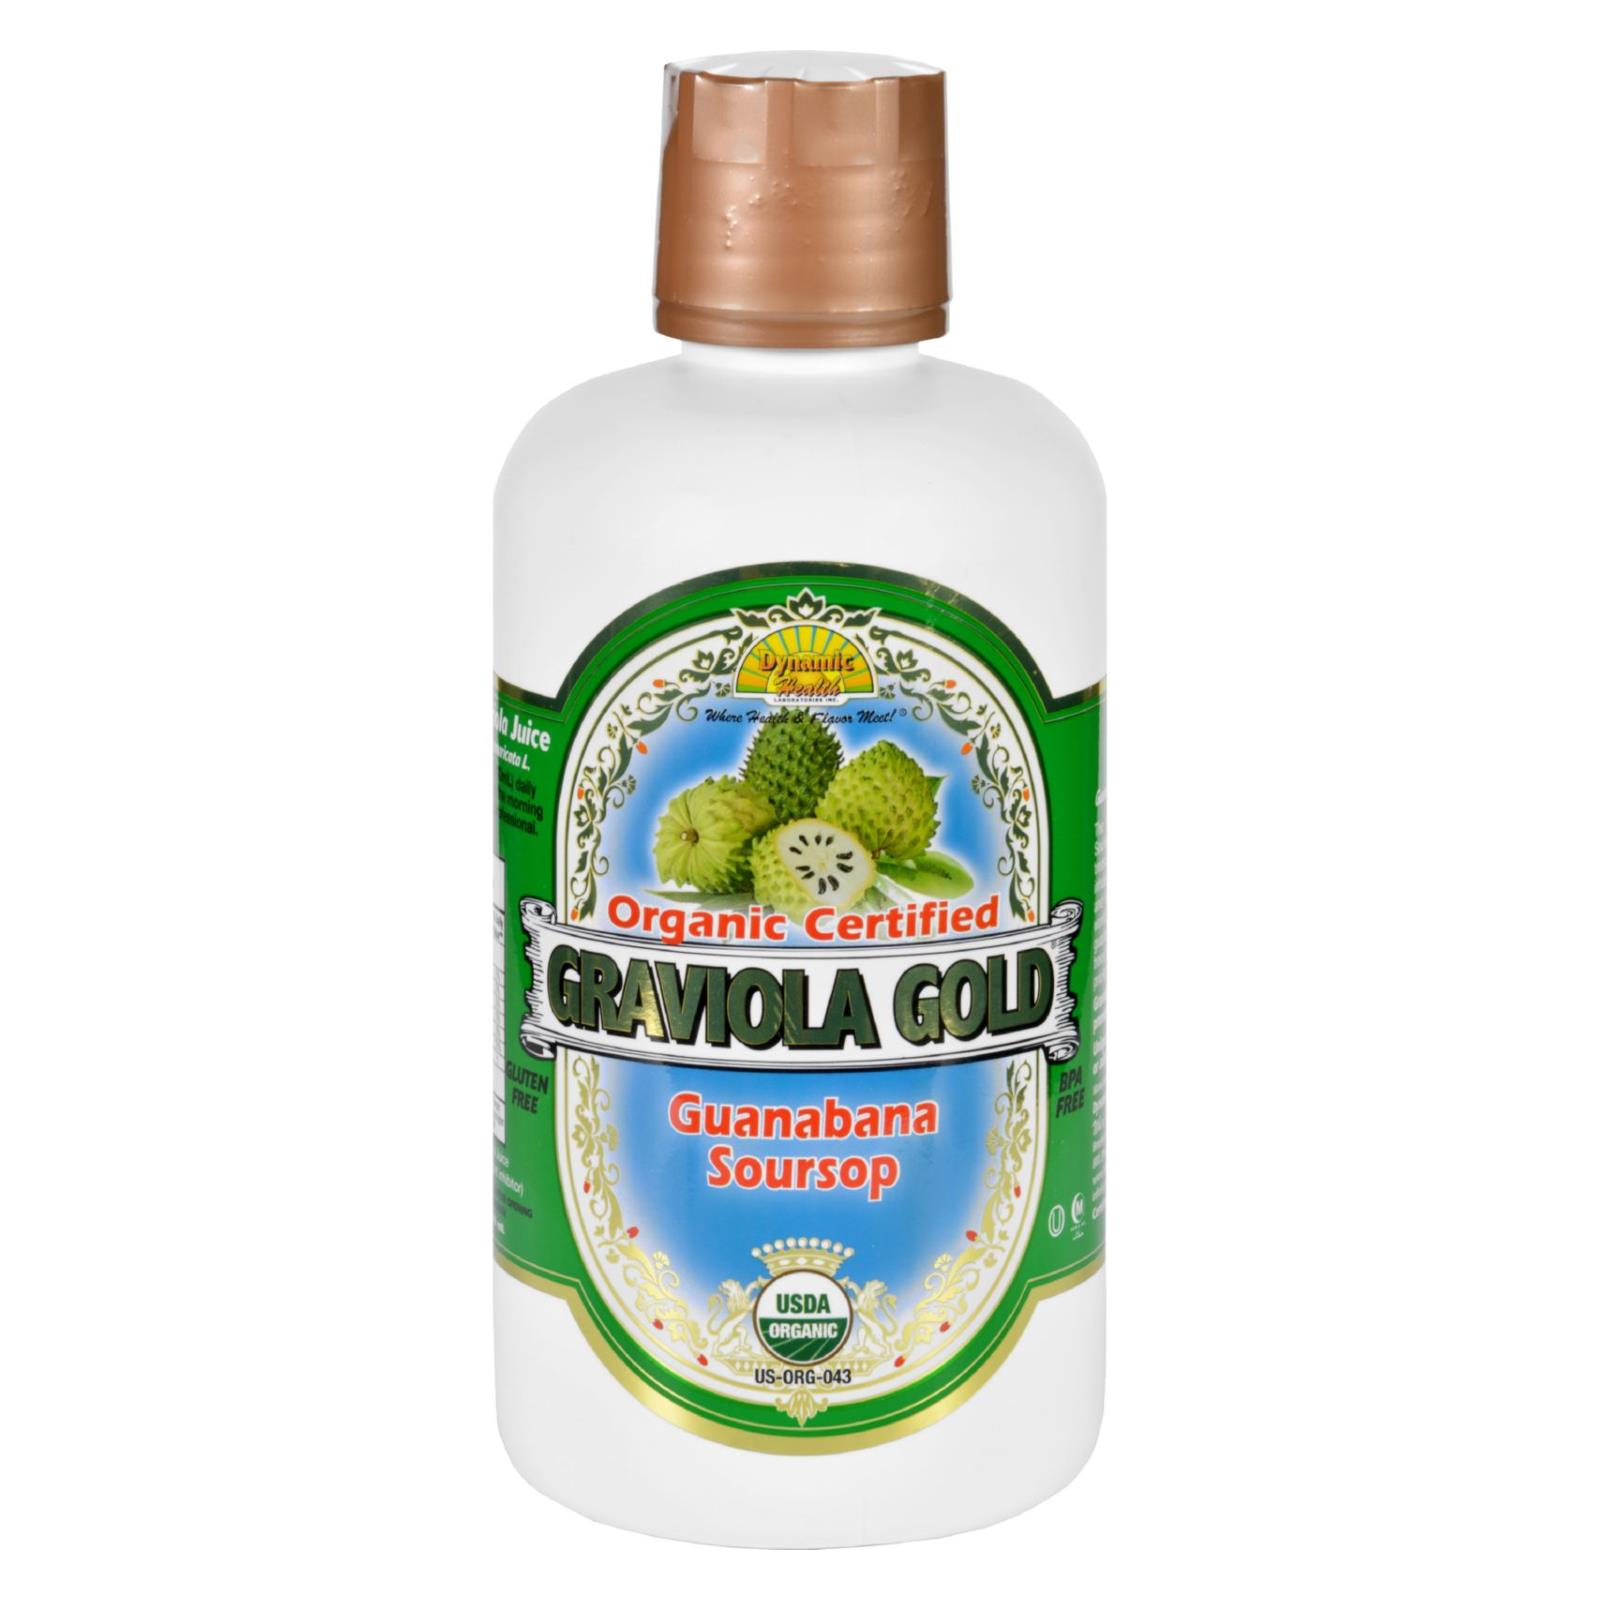 Dynamic Health Juice - Graviola Gold - Organic Certified - 32 oz